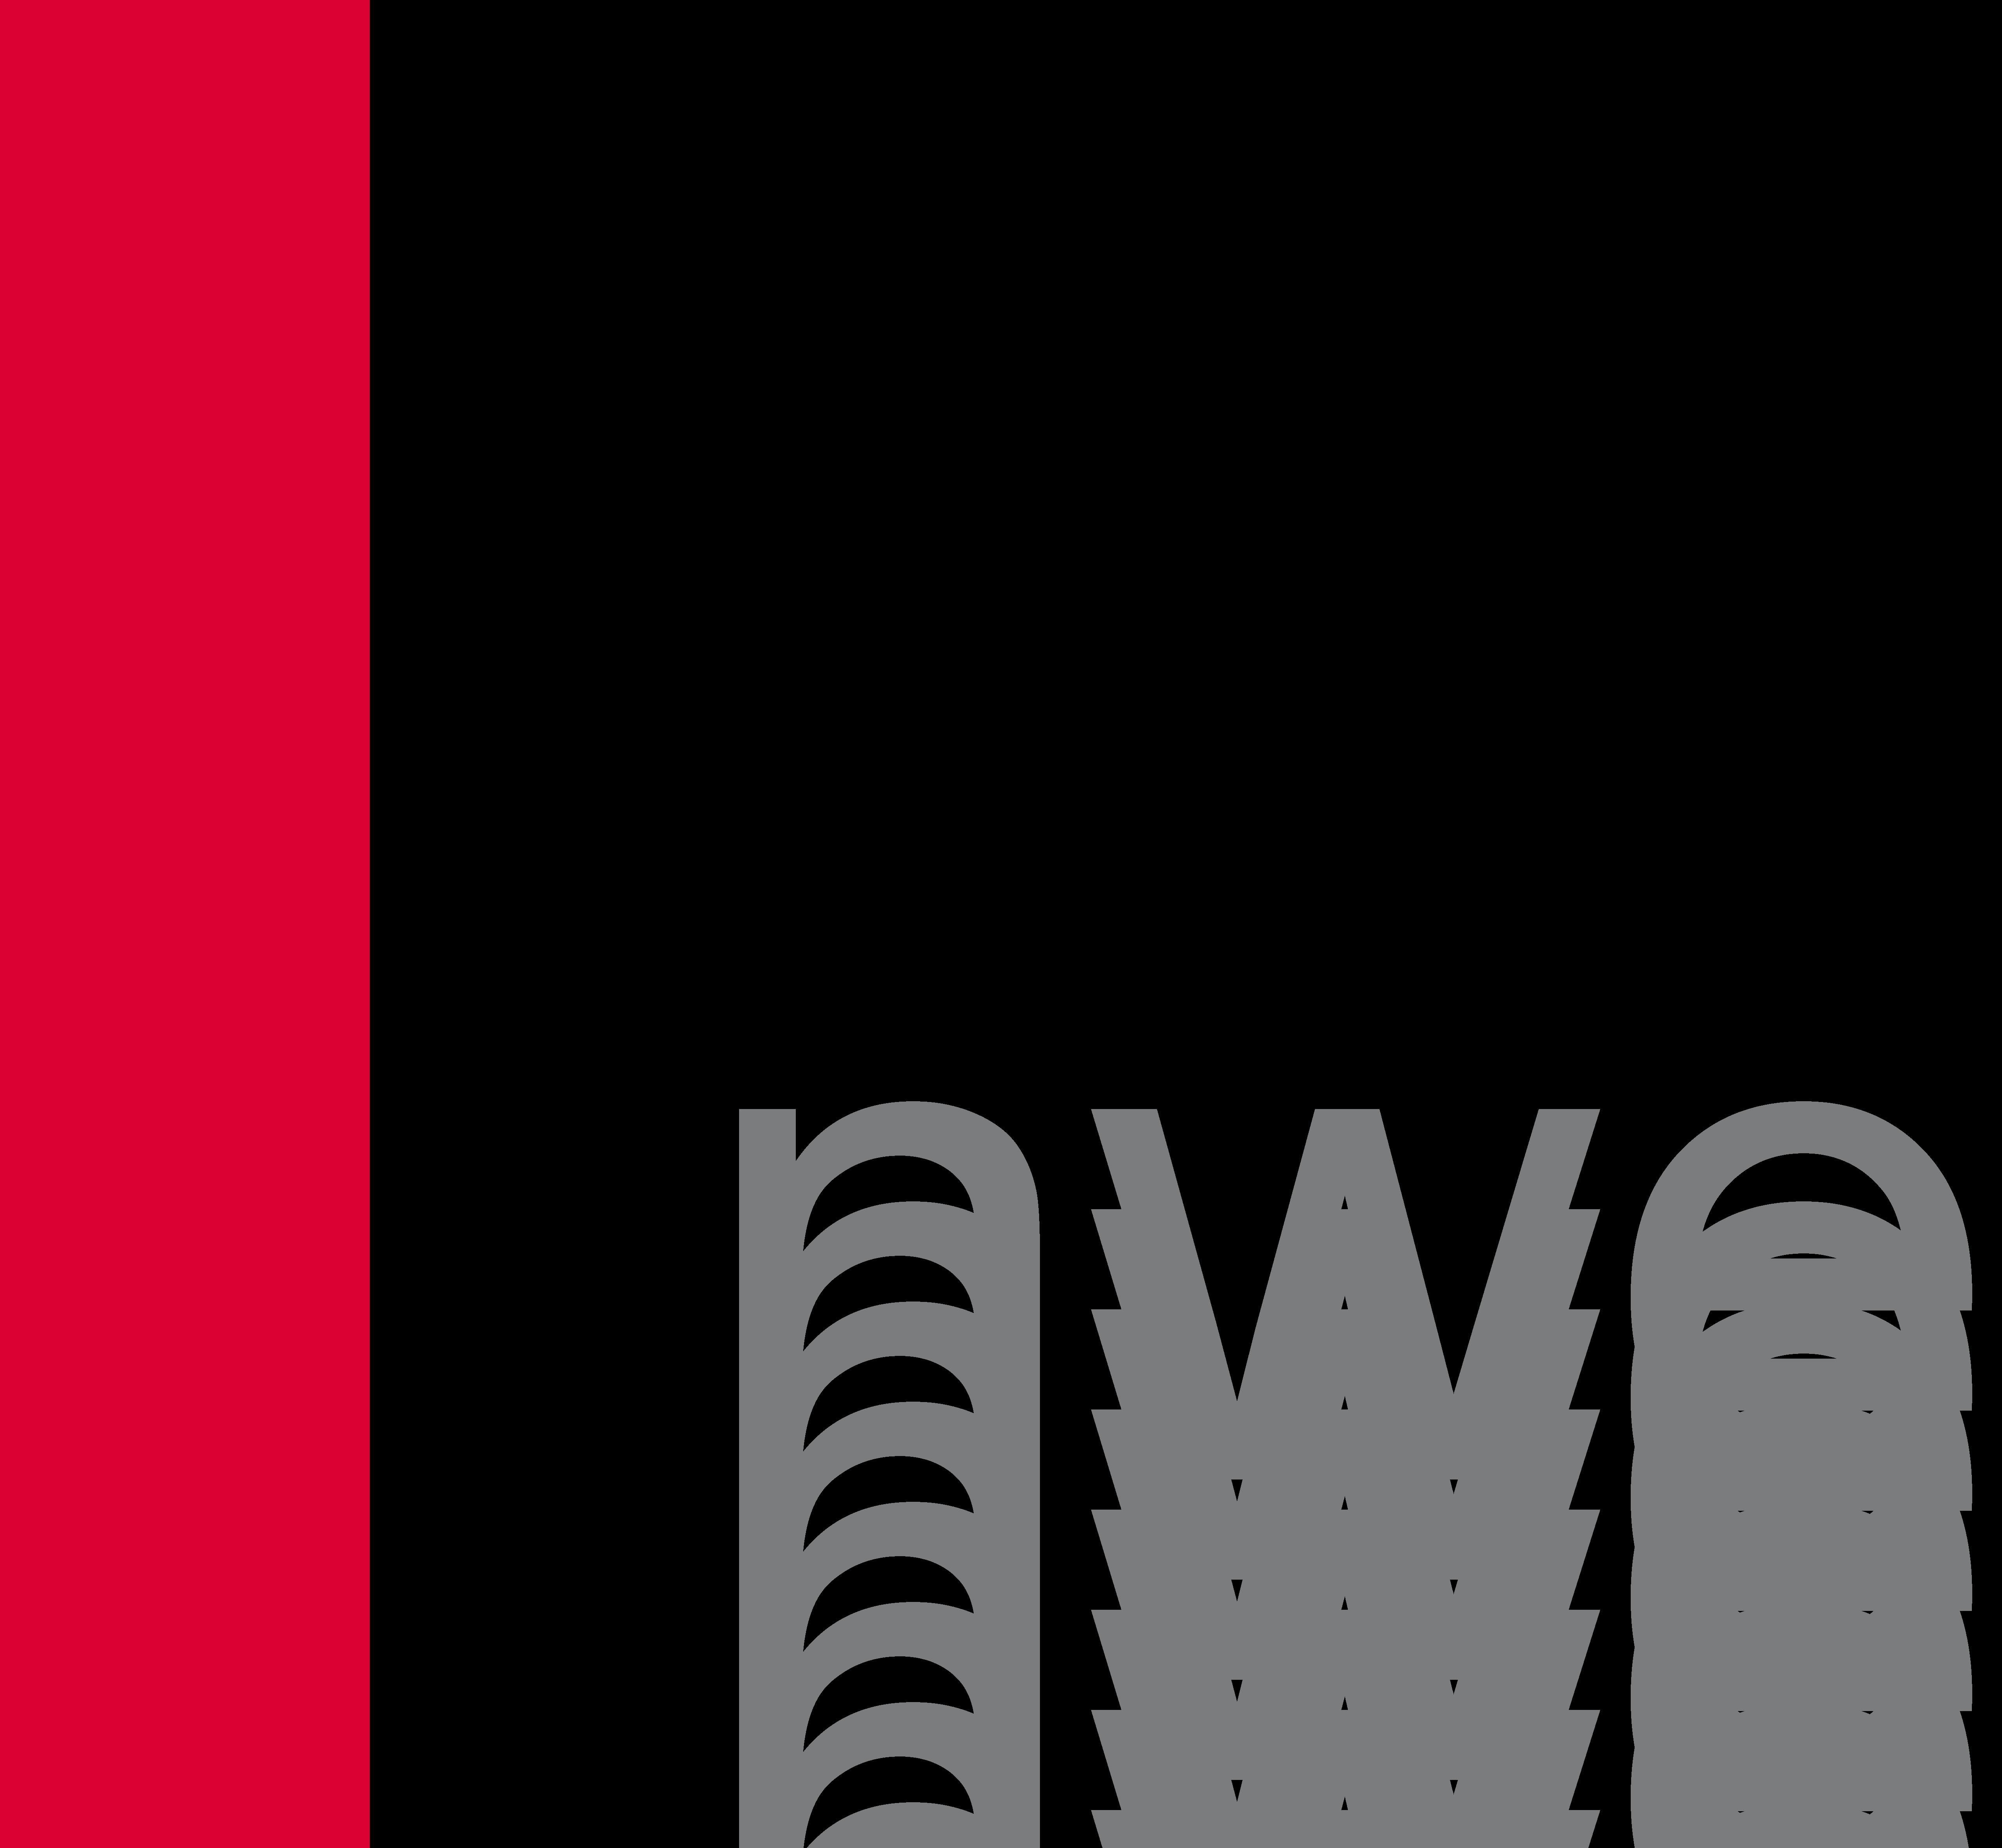 nwe logo 31 03 2008